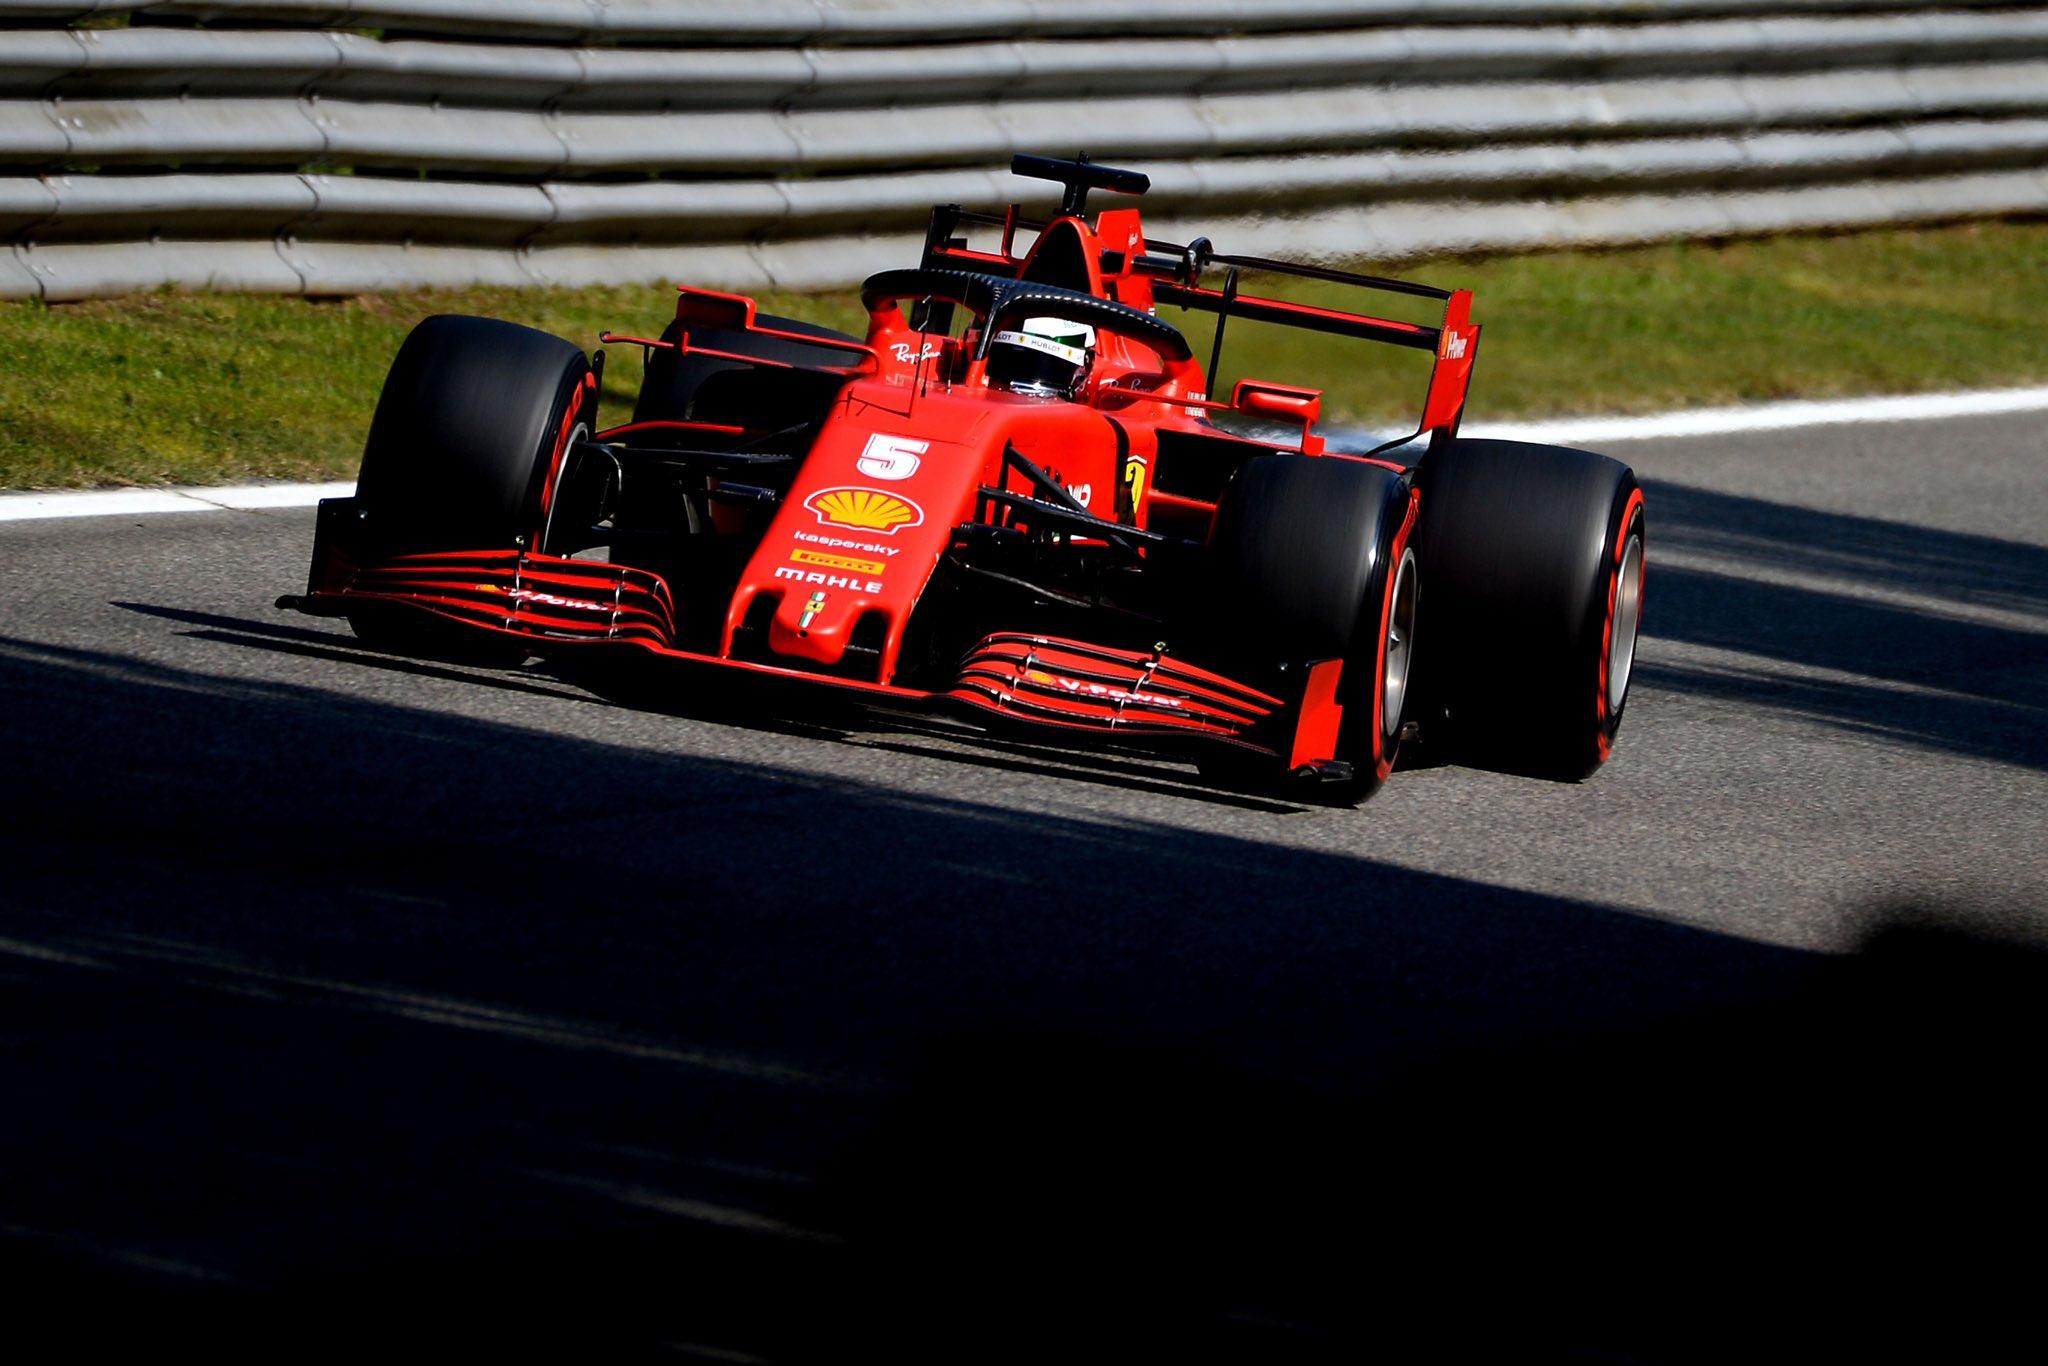 Себастьян Феттель за рулём болида Ferrari в сезоне-2020